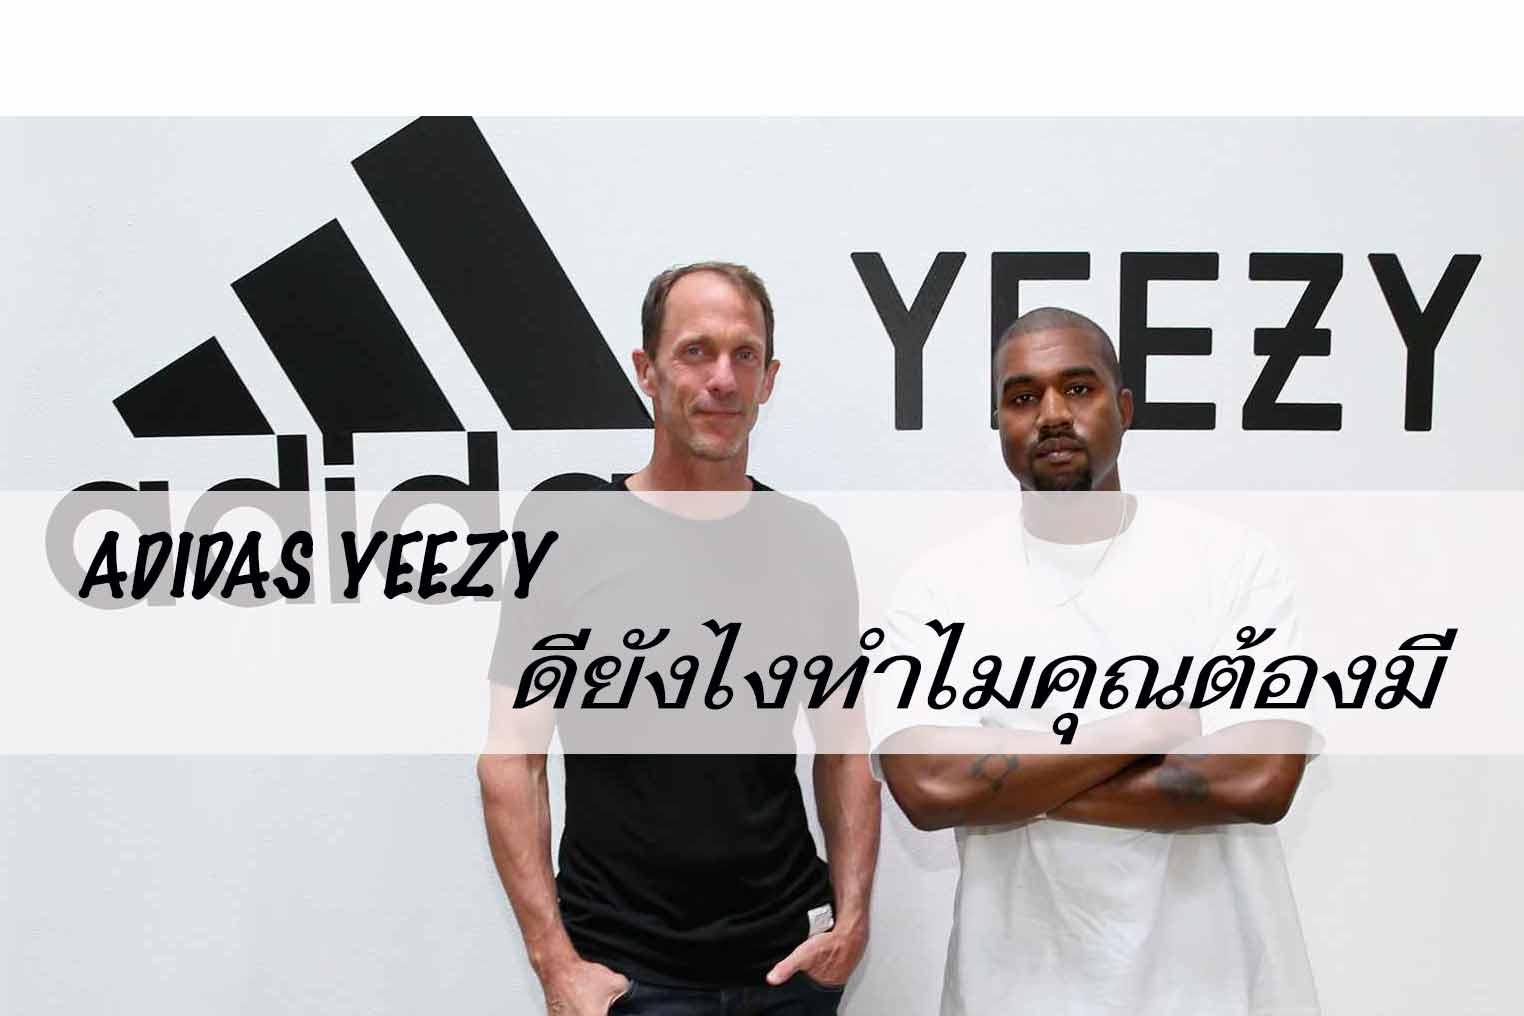 adidas yeezy ดียังไงทำไมต้องม่